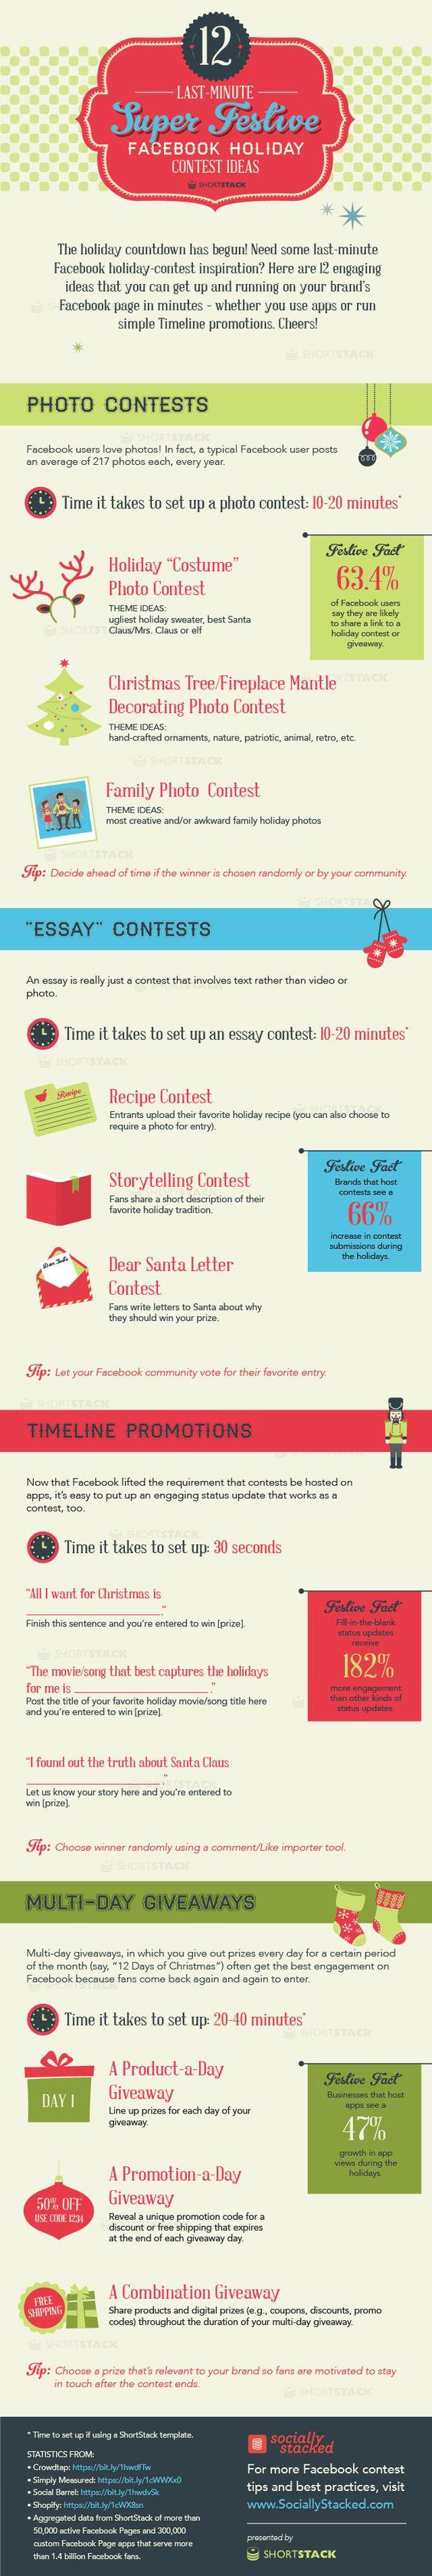 Super festive FaceBook holiday contest ideas #infografia #infographic #marketing